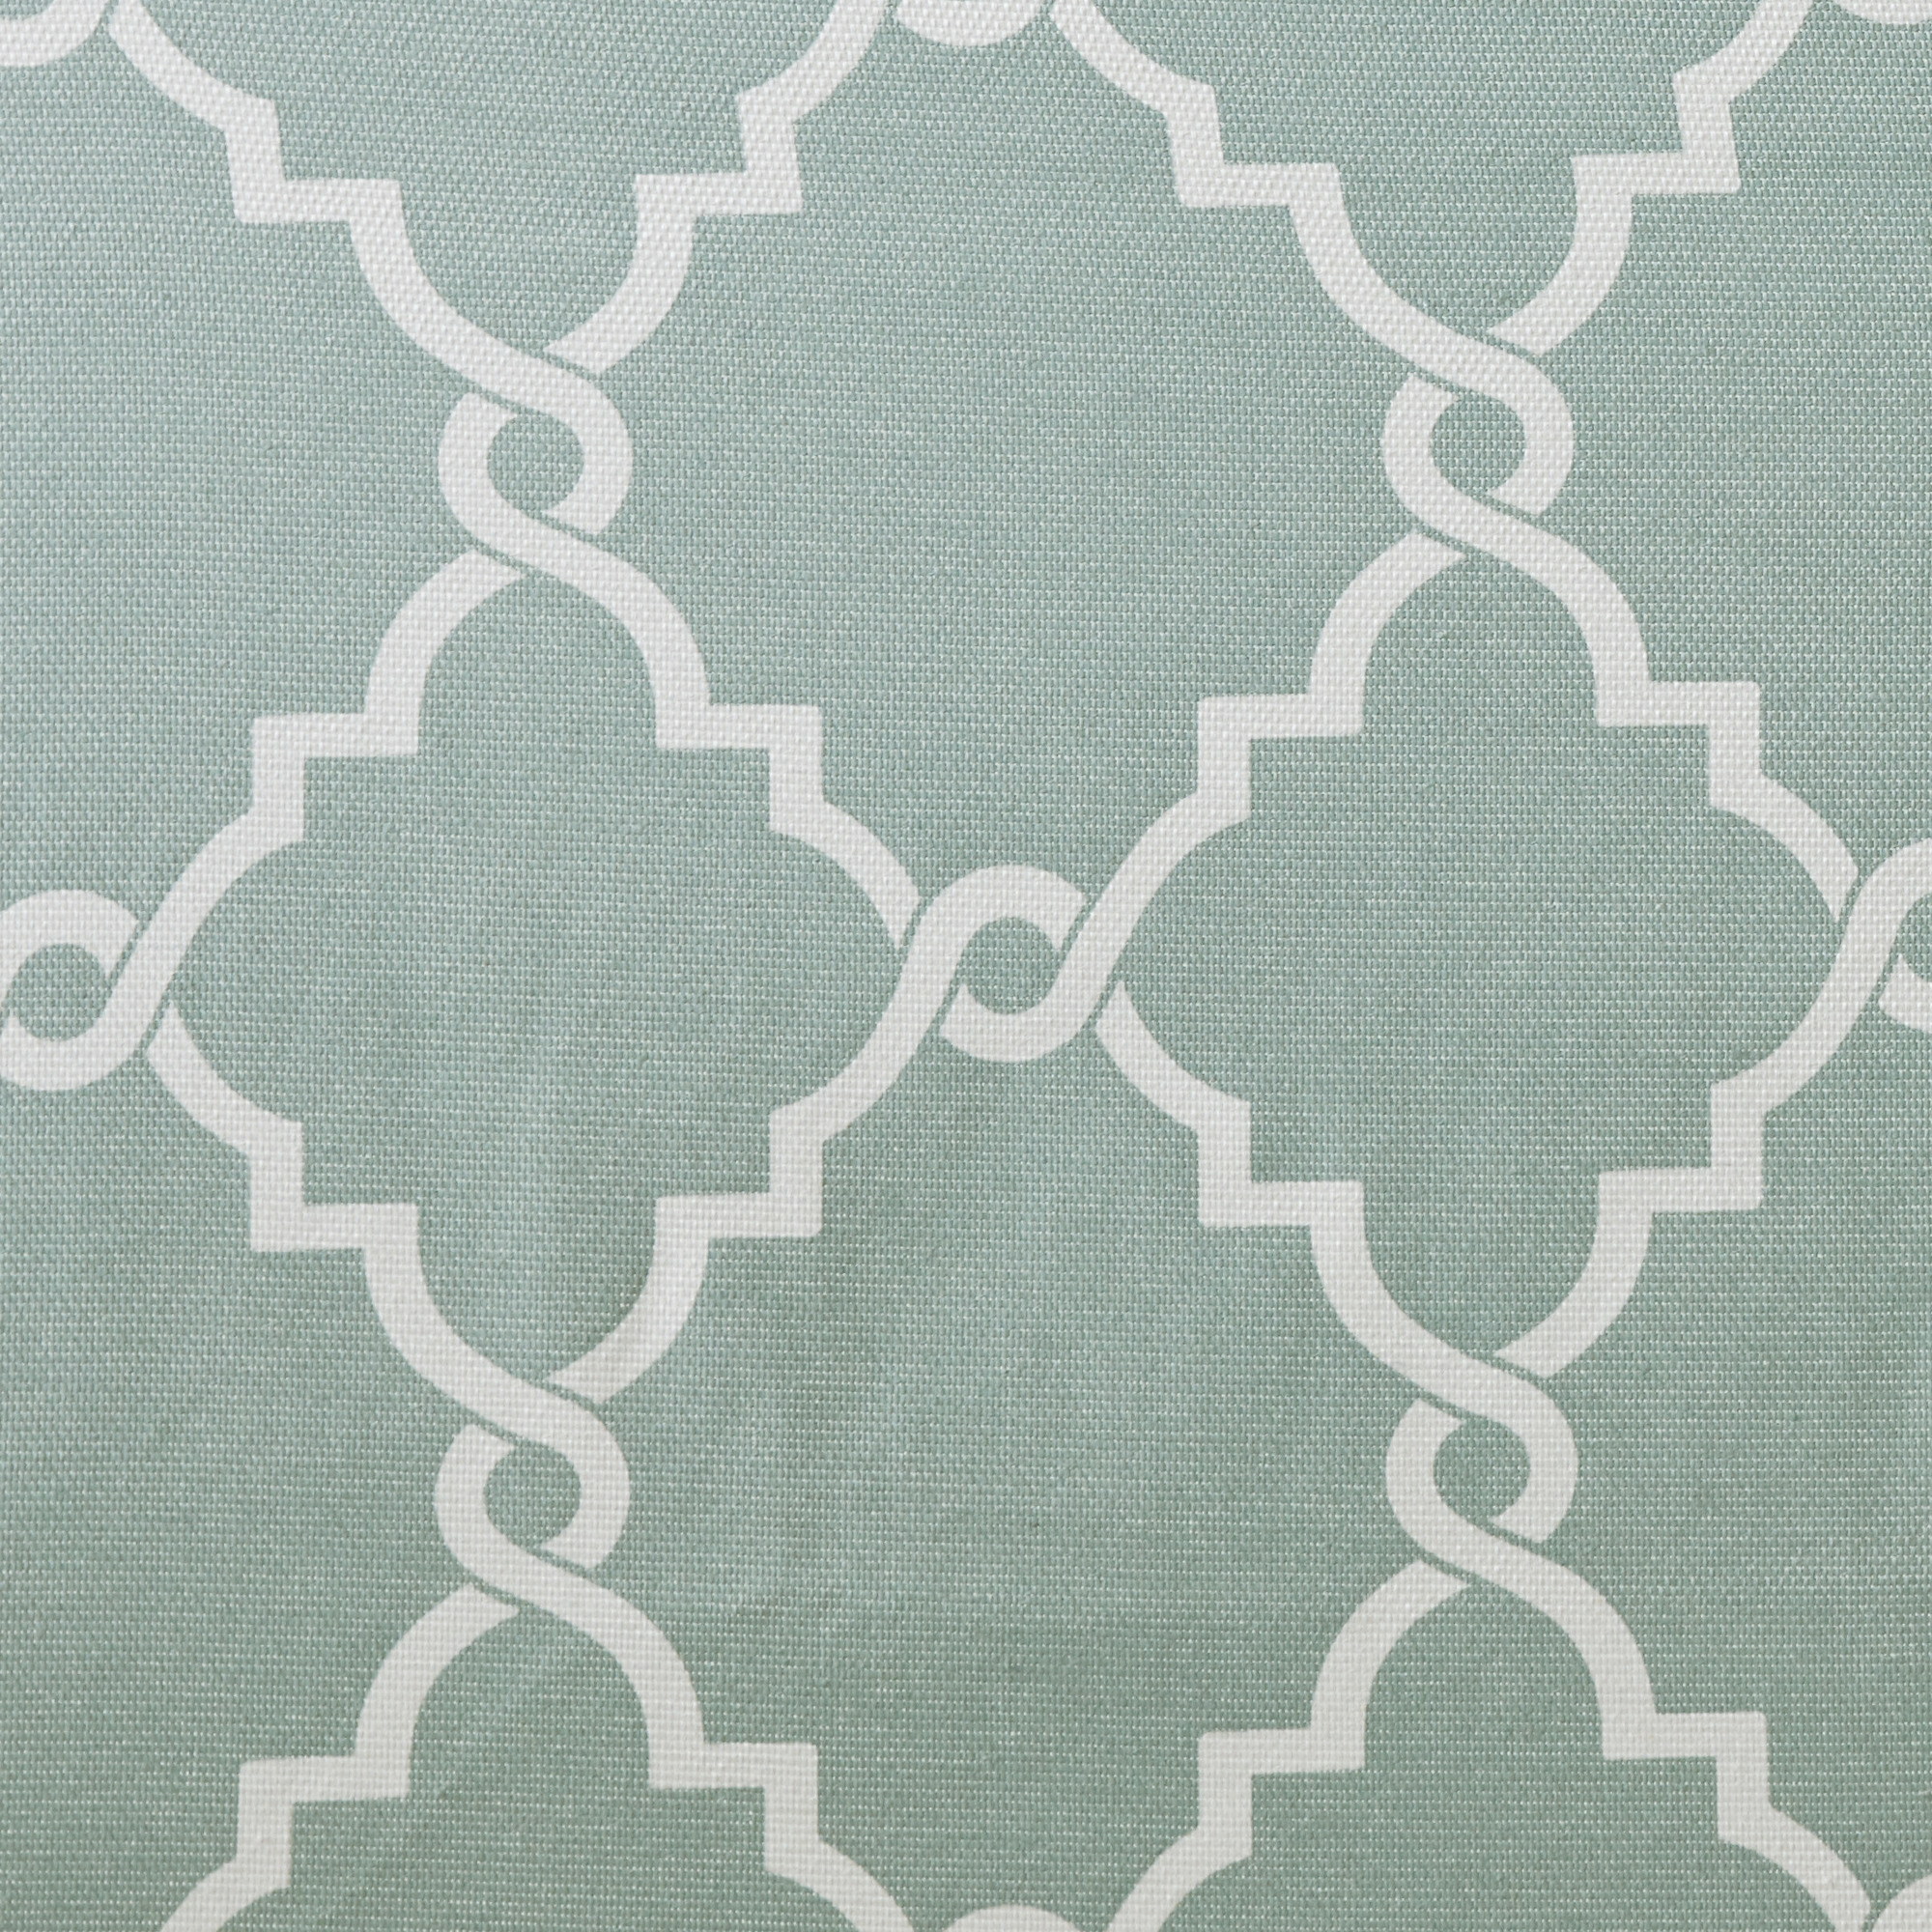 Home Essence Sereno fretwork Shower Curtain - Walmart.com